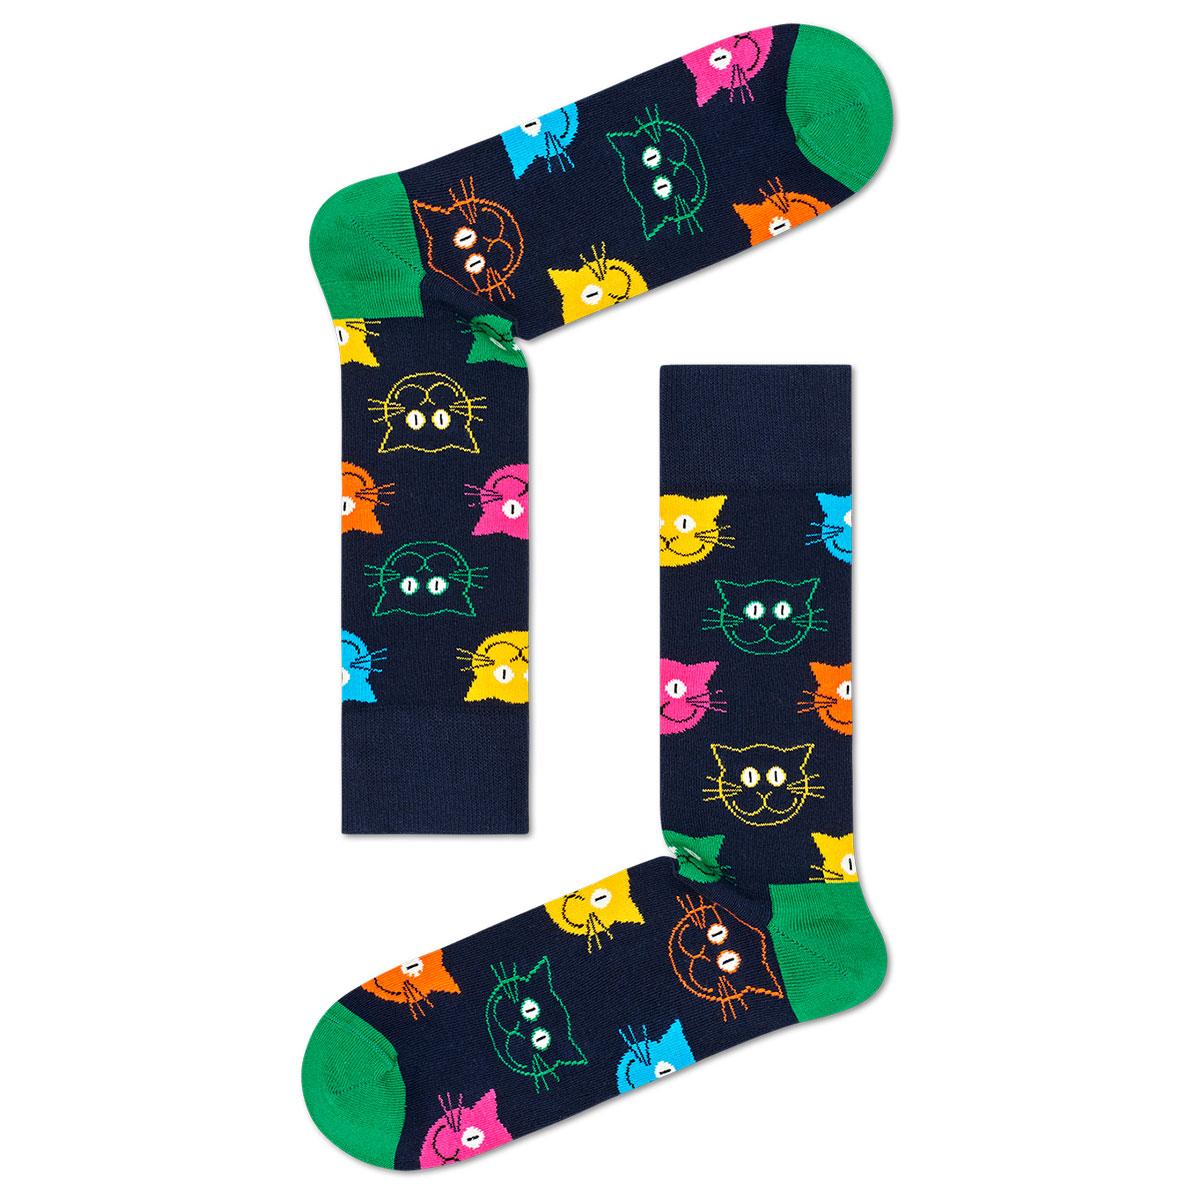 Happy Socks ハッピーソックス  MIXED CAT( ミックスド キャット ) 3足組 ギフトセット 綿混 クルー丈 ソックス 靴下 GIFT BOX ユニセックス レディース 女性 婦人 プレゼント ギフト 11140001【ゆうパケットお取り扱い不可】